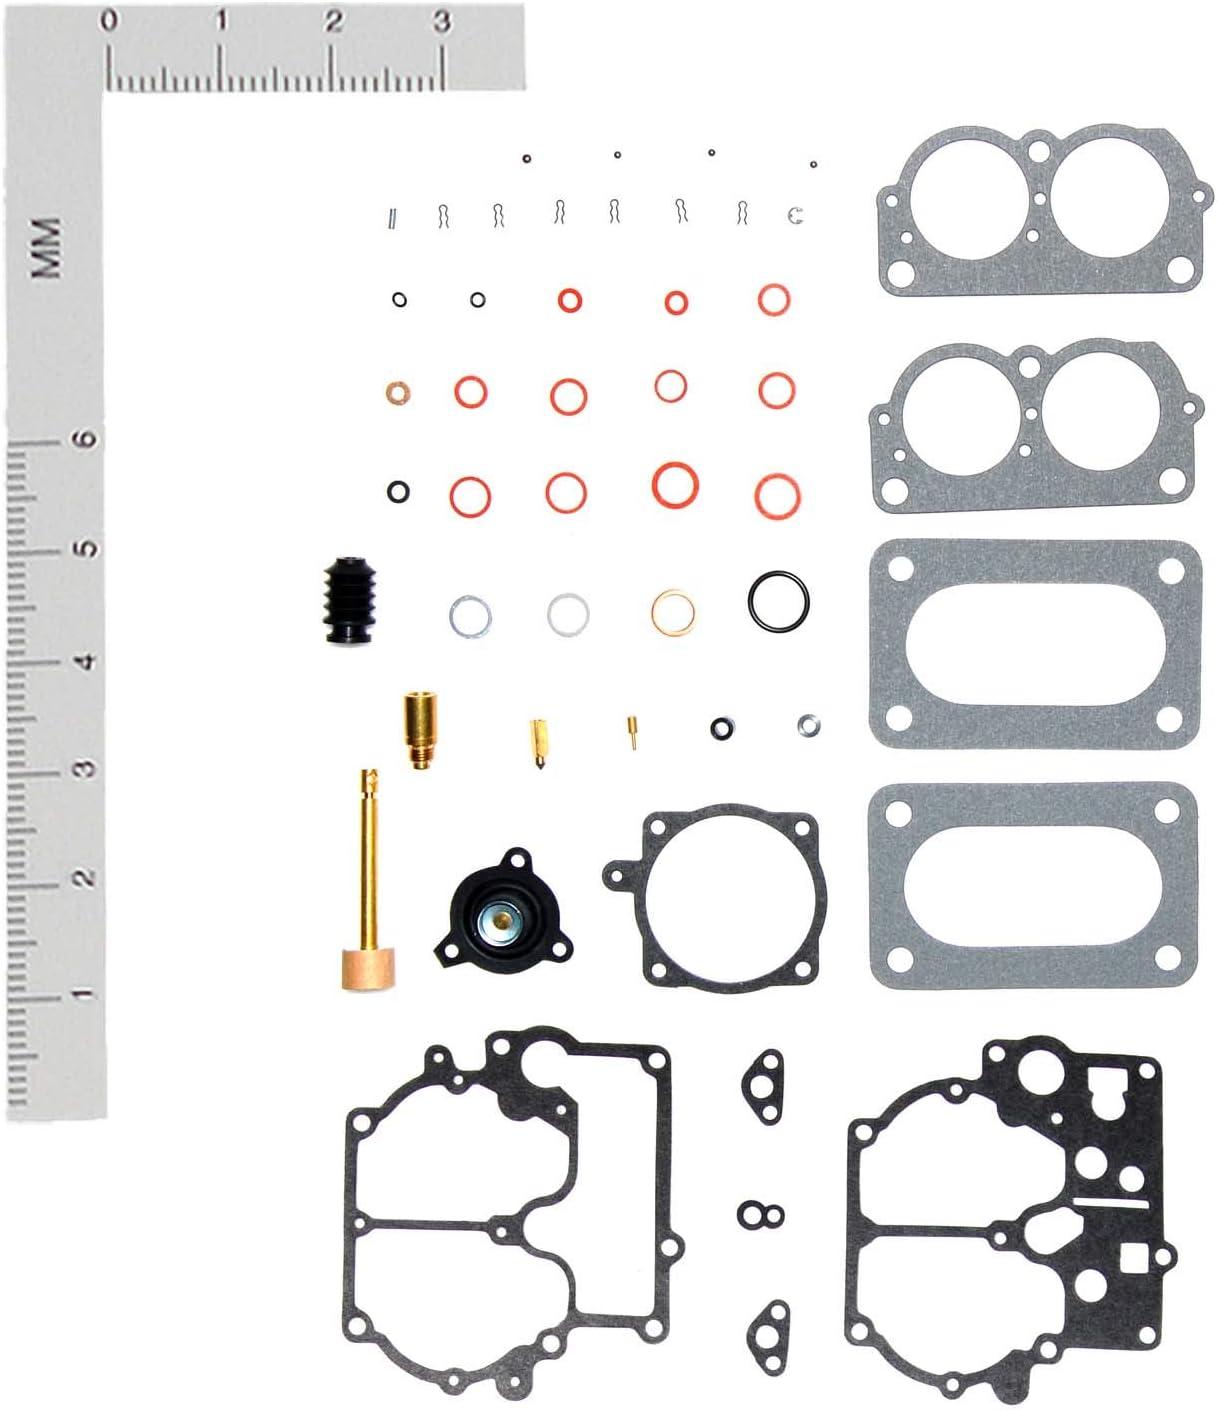 Dallas Mall Walker Albuquerque Mall Products 15829A Carburetor Kit